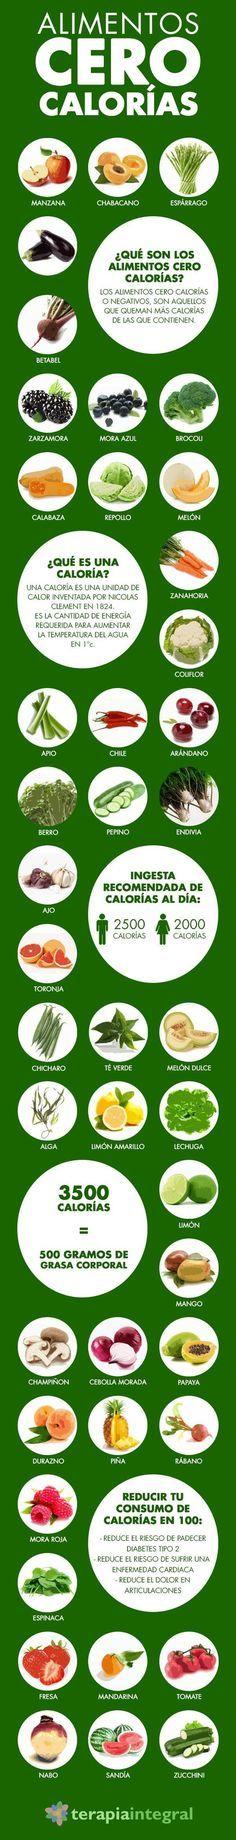 42 alimentos con cero calorías. #nutrición #salud #infografía: